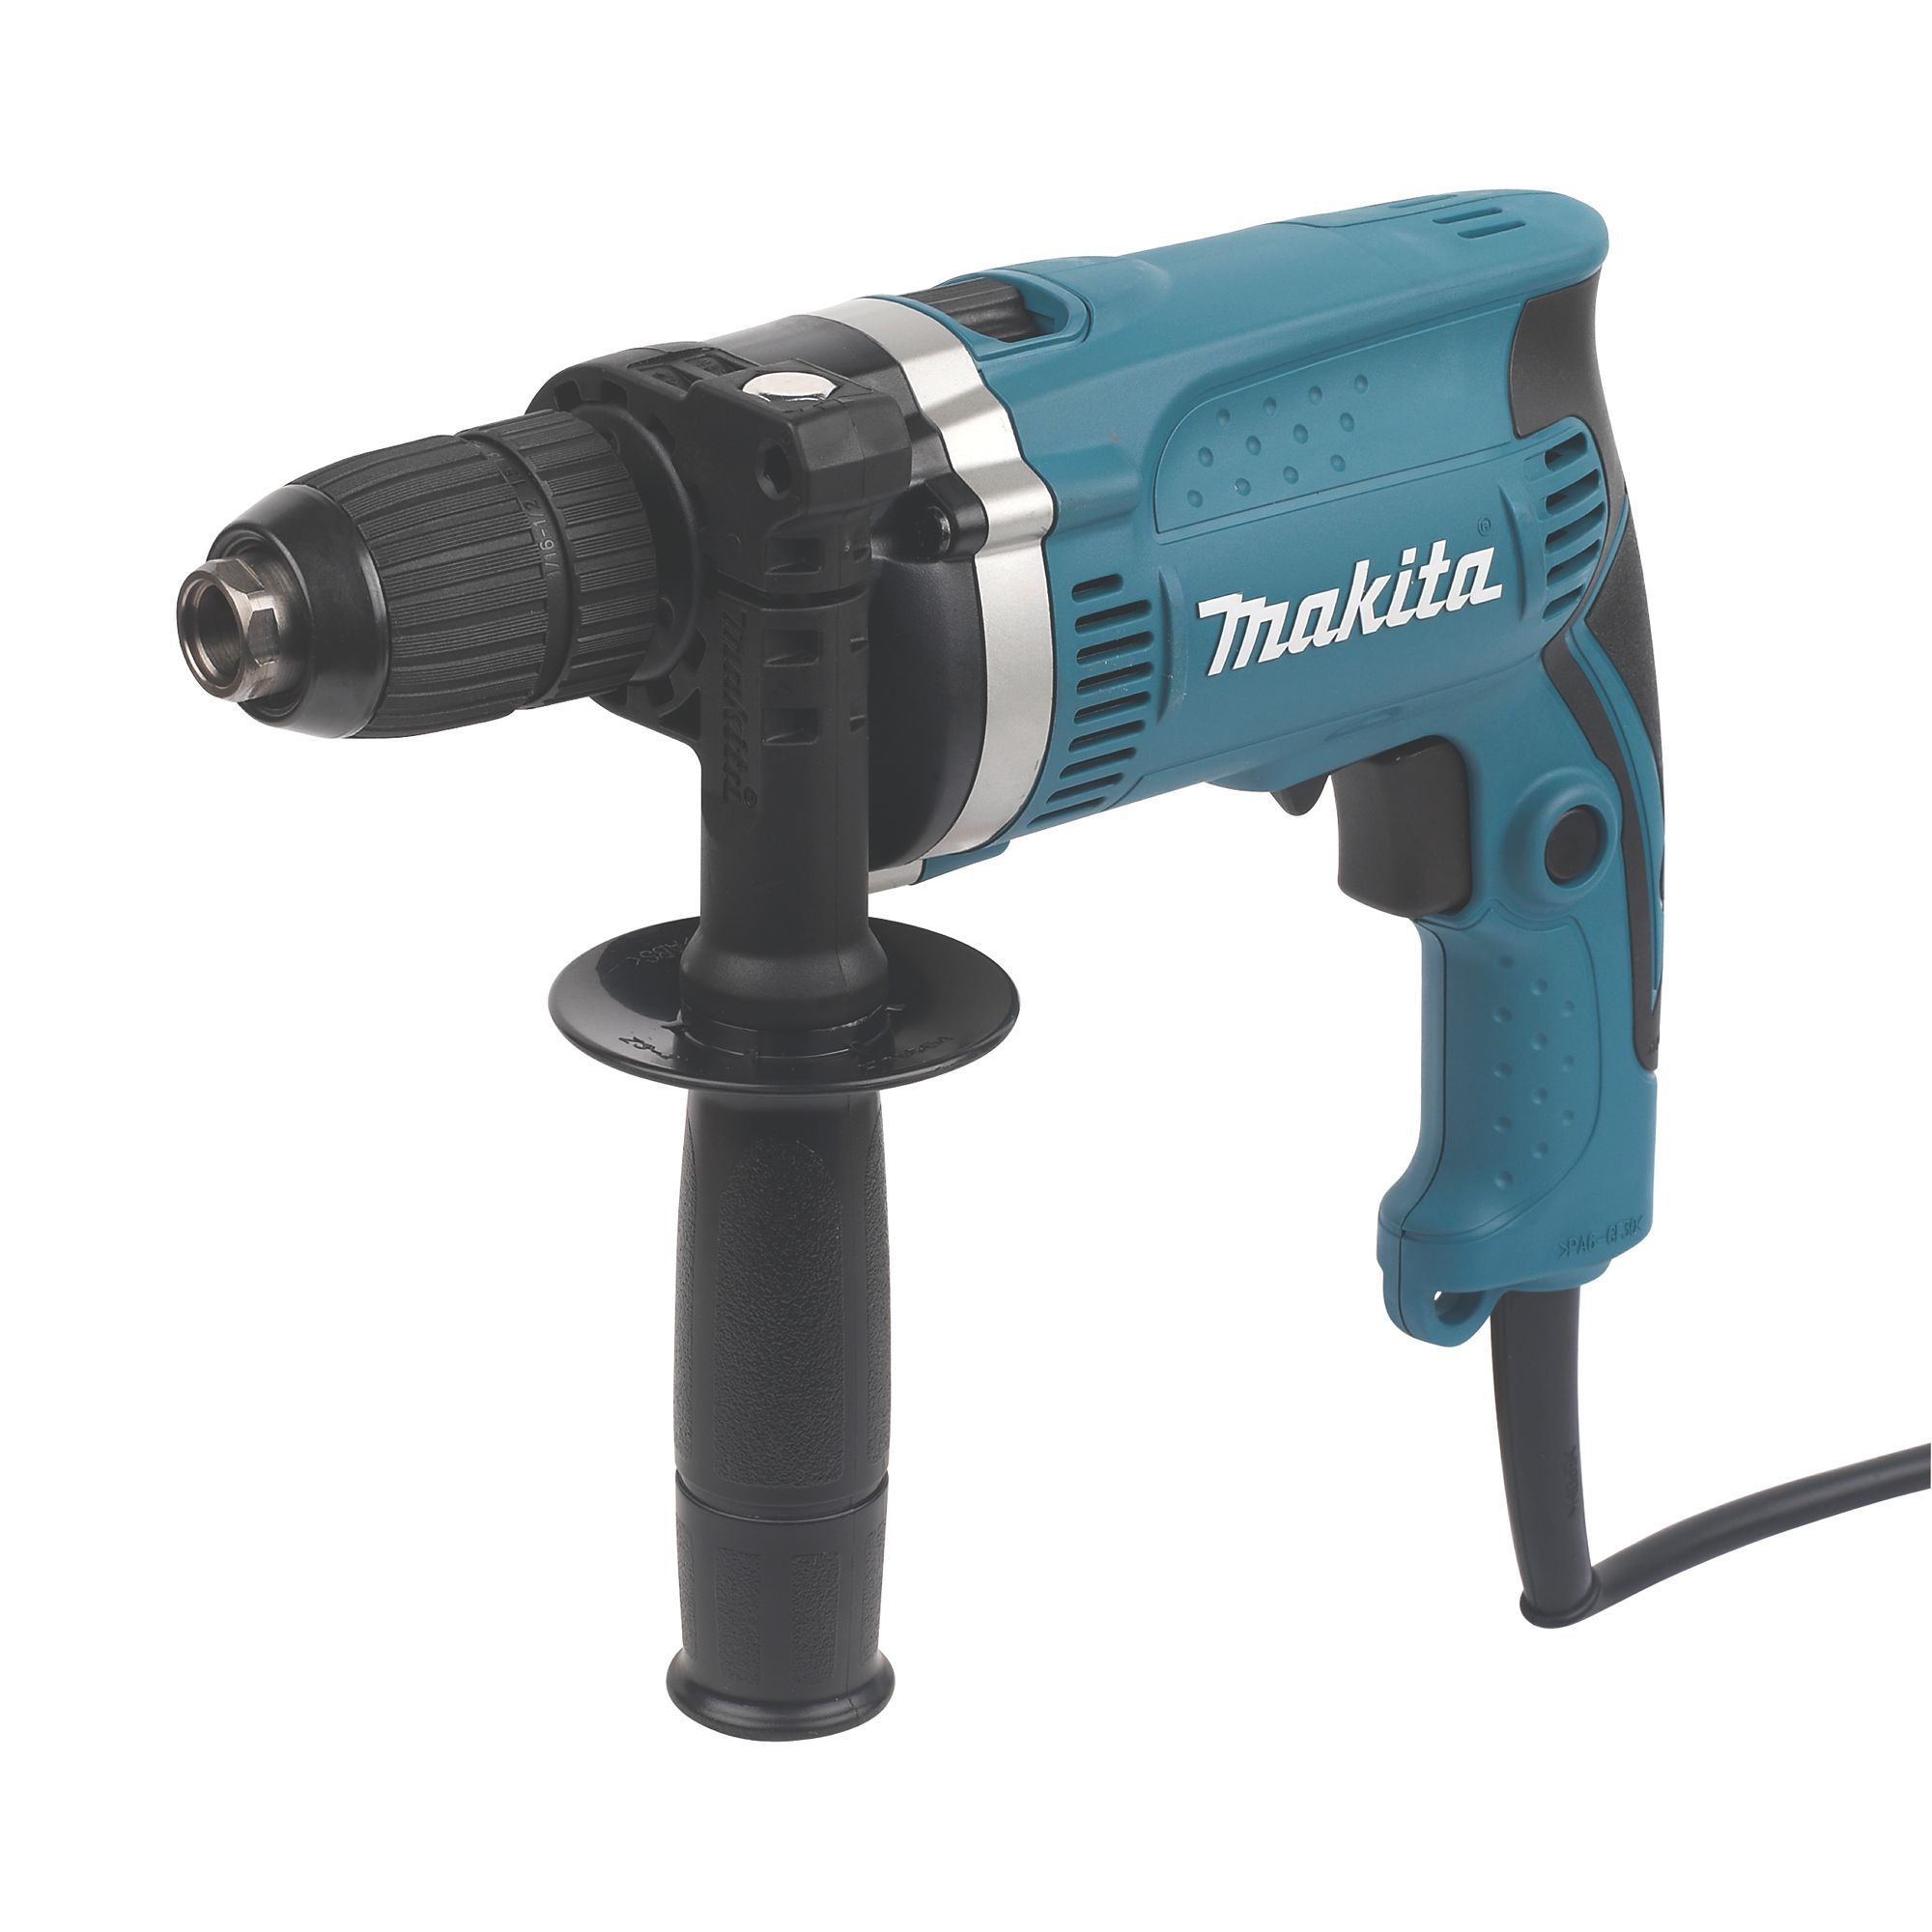 Makita 710w 240v Corded Keyless Chuck Brushed Hammer Drill